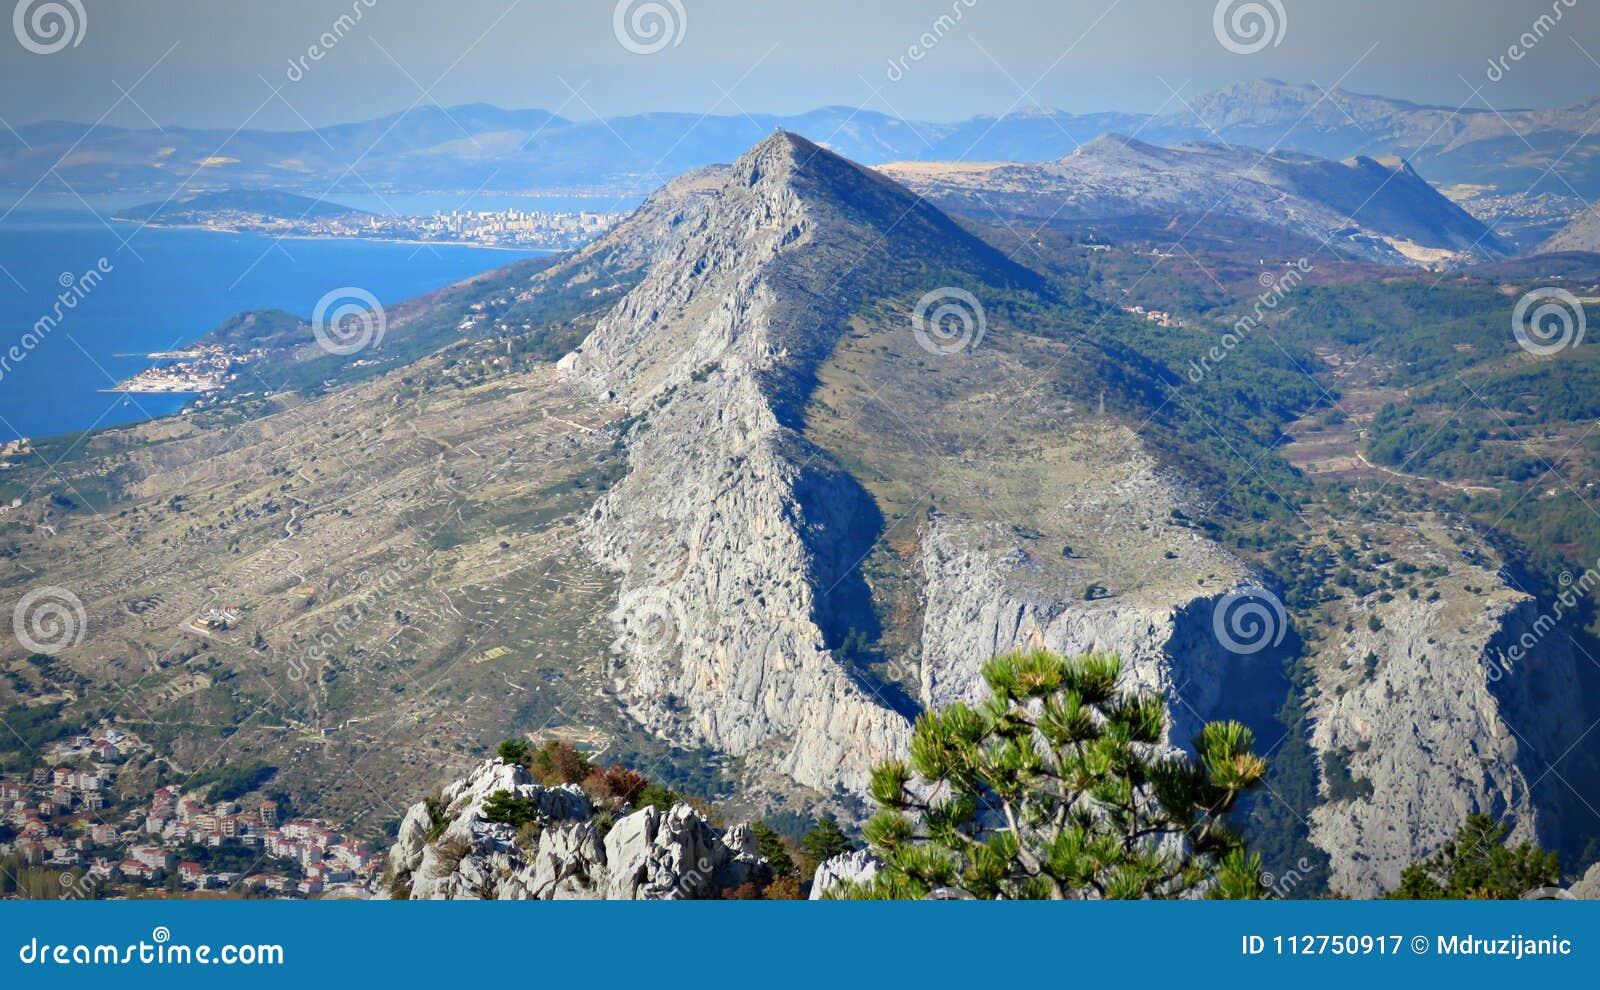 On top of the town Omiš, Croatia